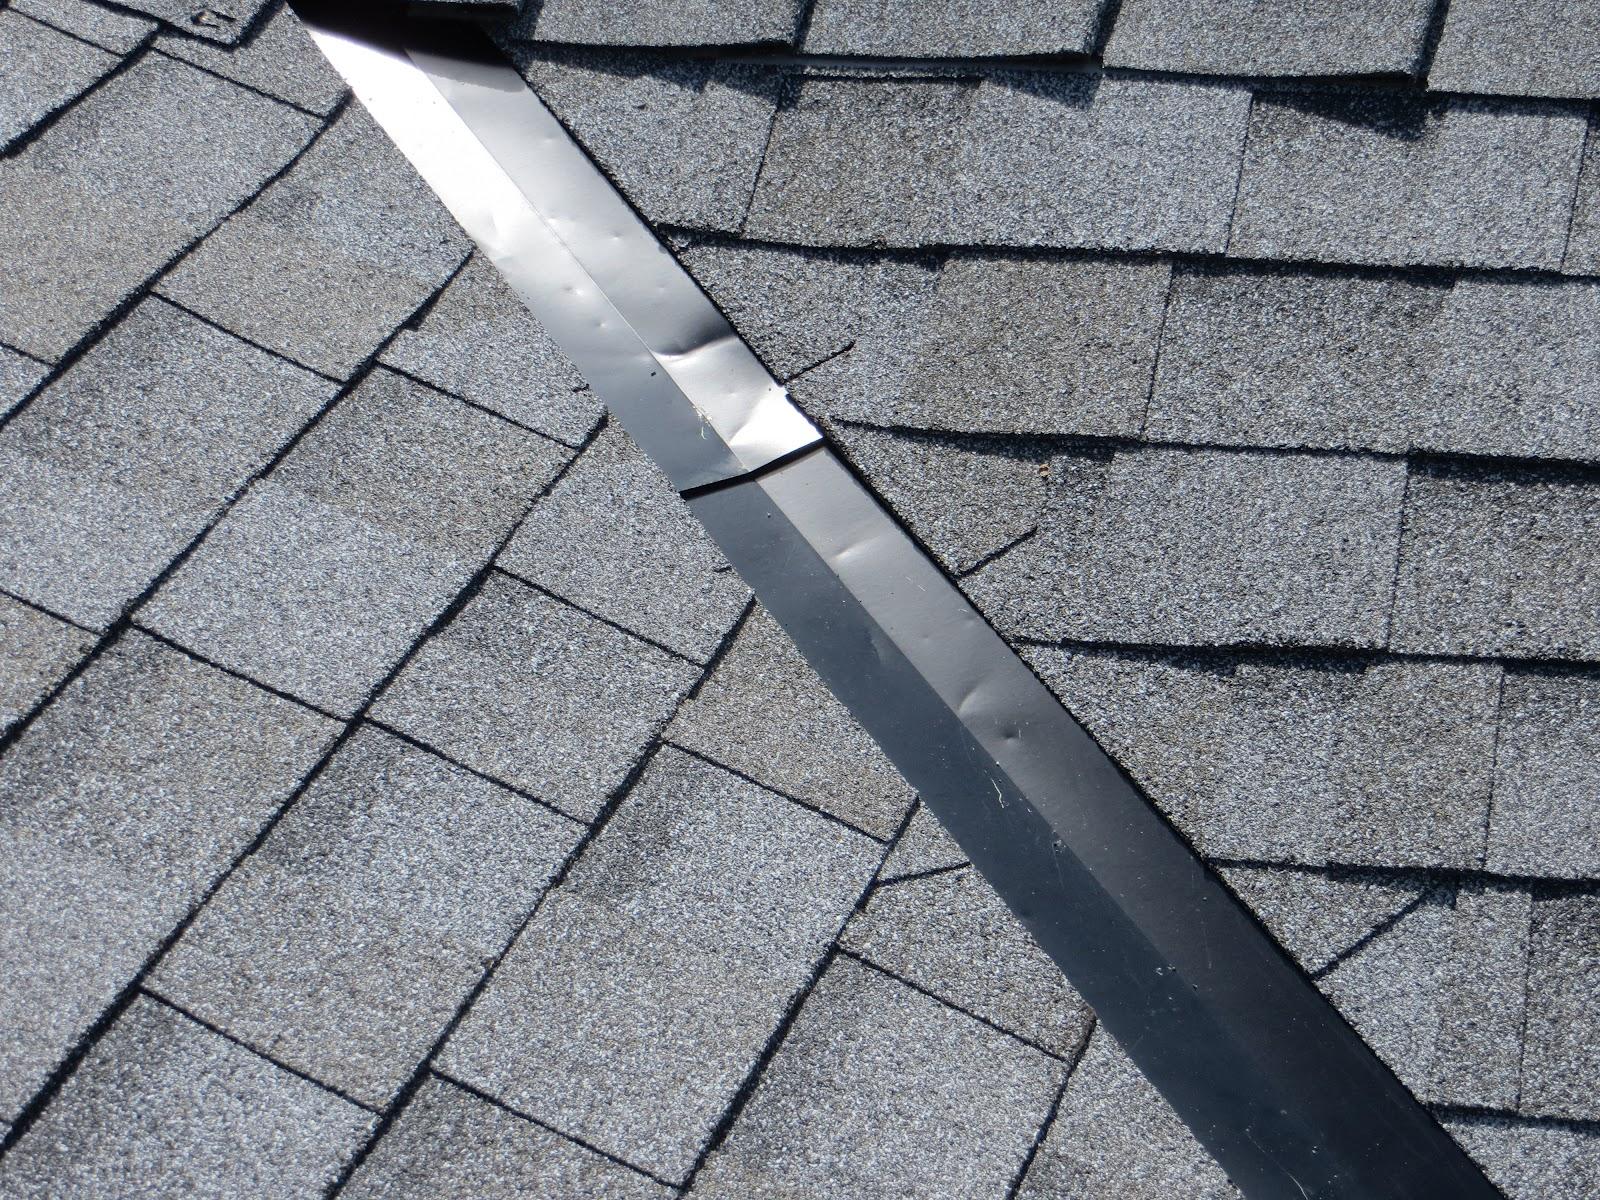 Calgary Skylight Repairs Calgary Hail Insurance Claims